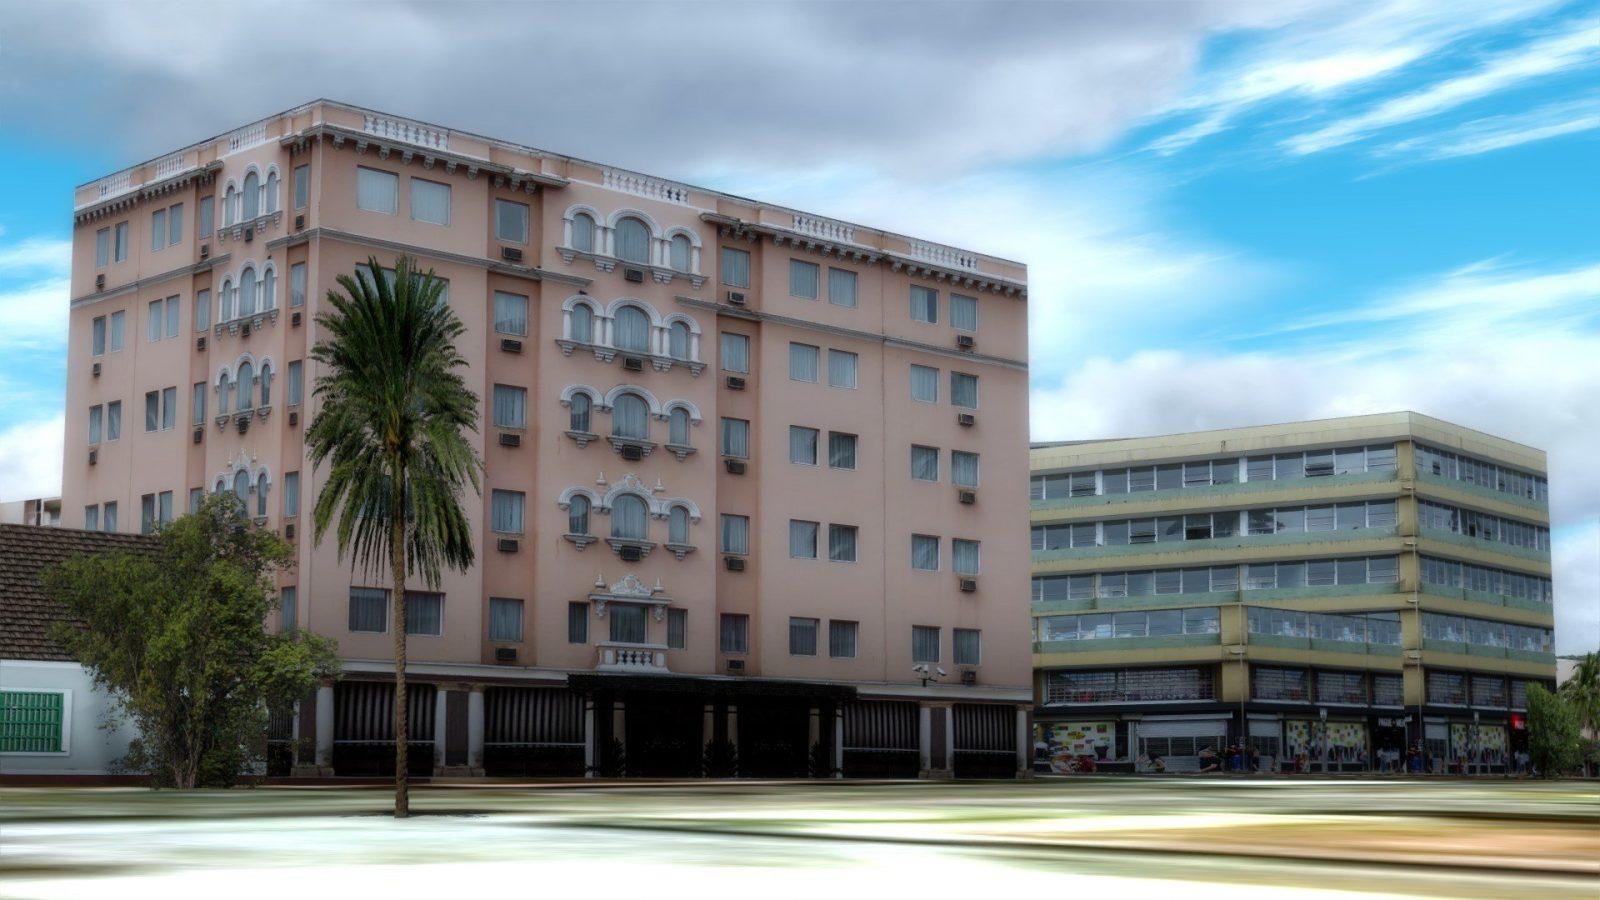 orbx-buildings-hd-previews-17-1600x900.j